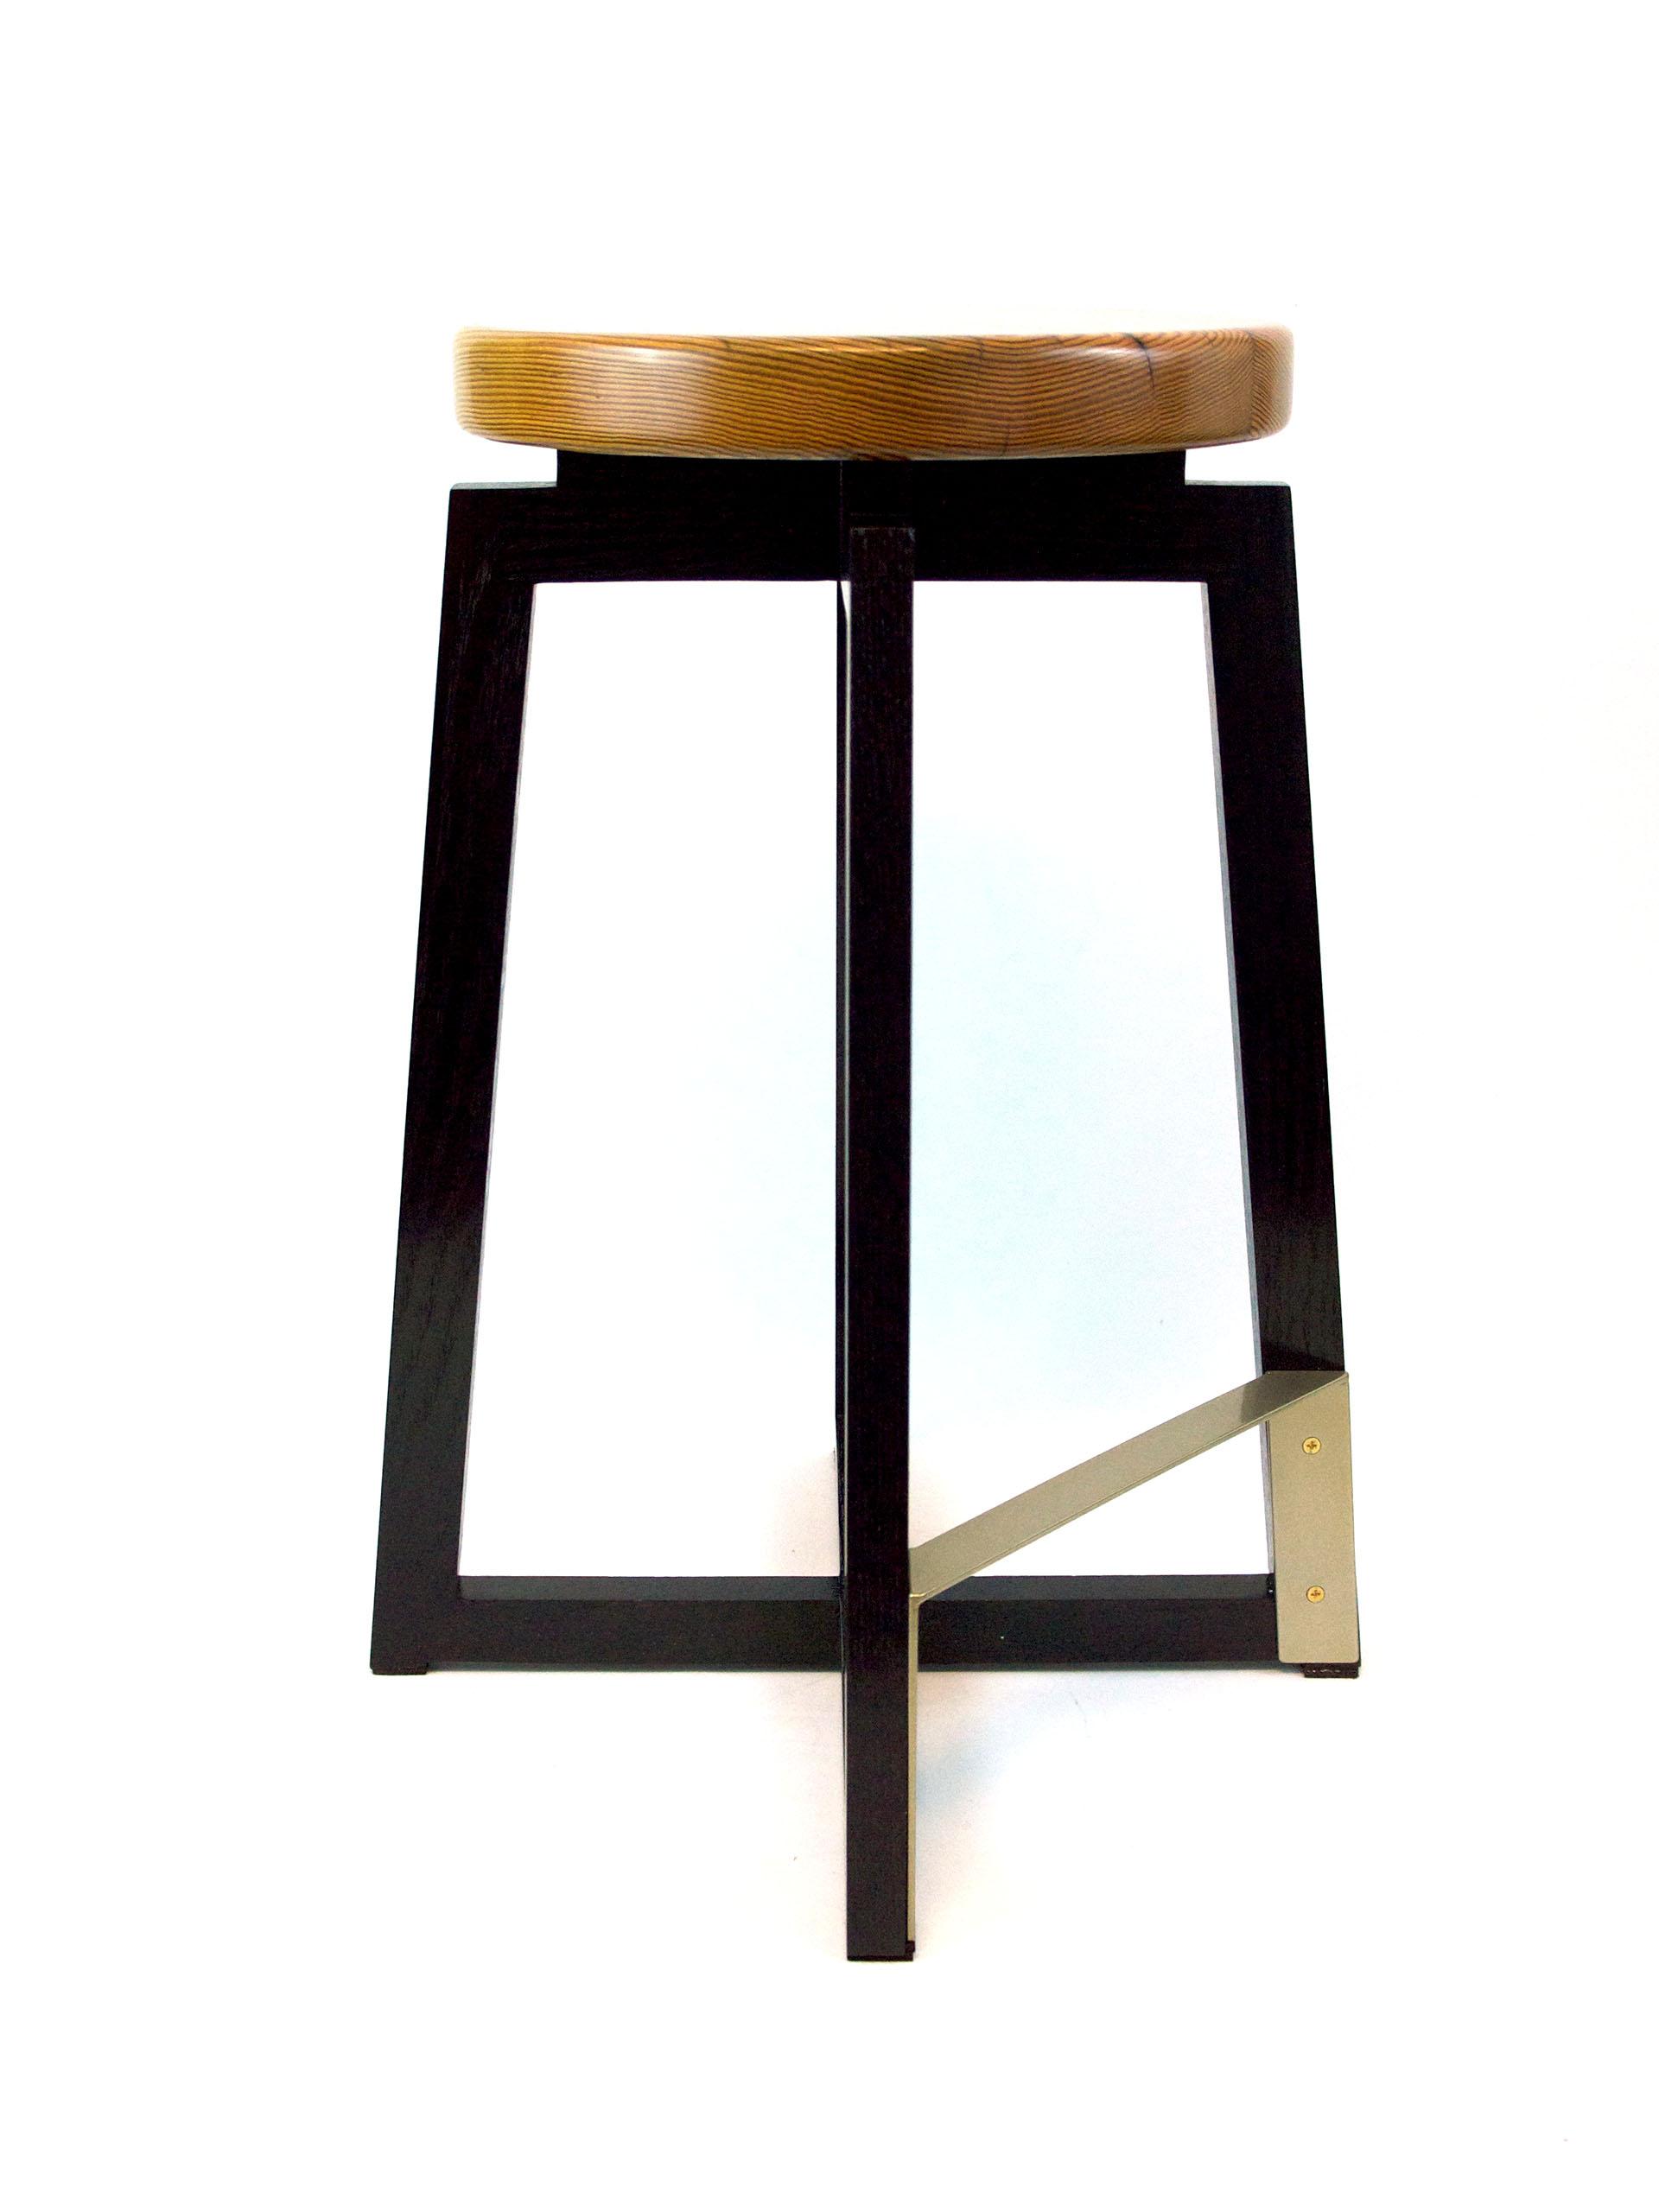 Picke wood stool 3.jpg